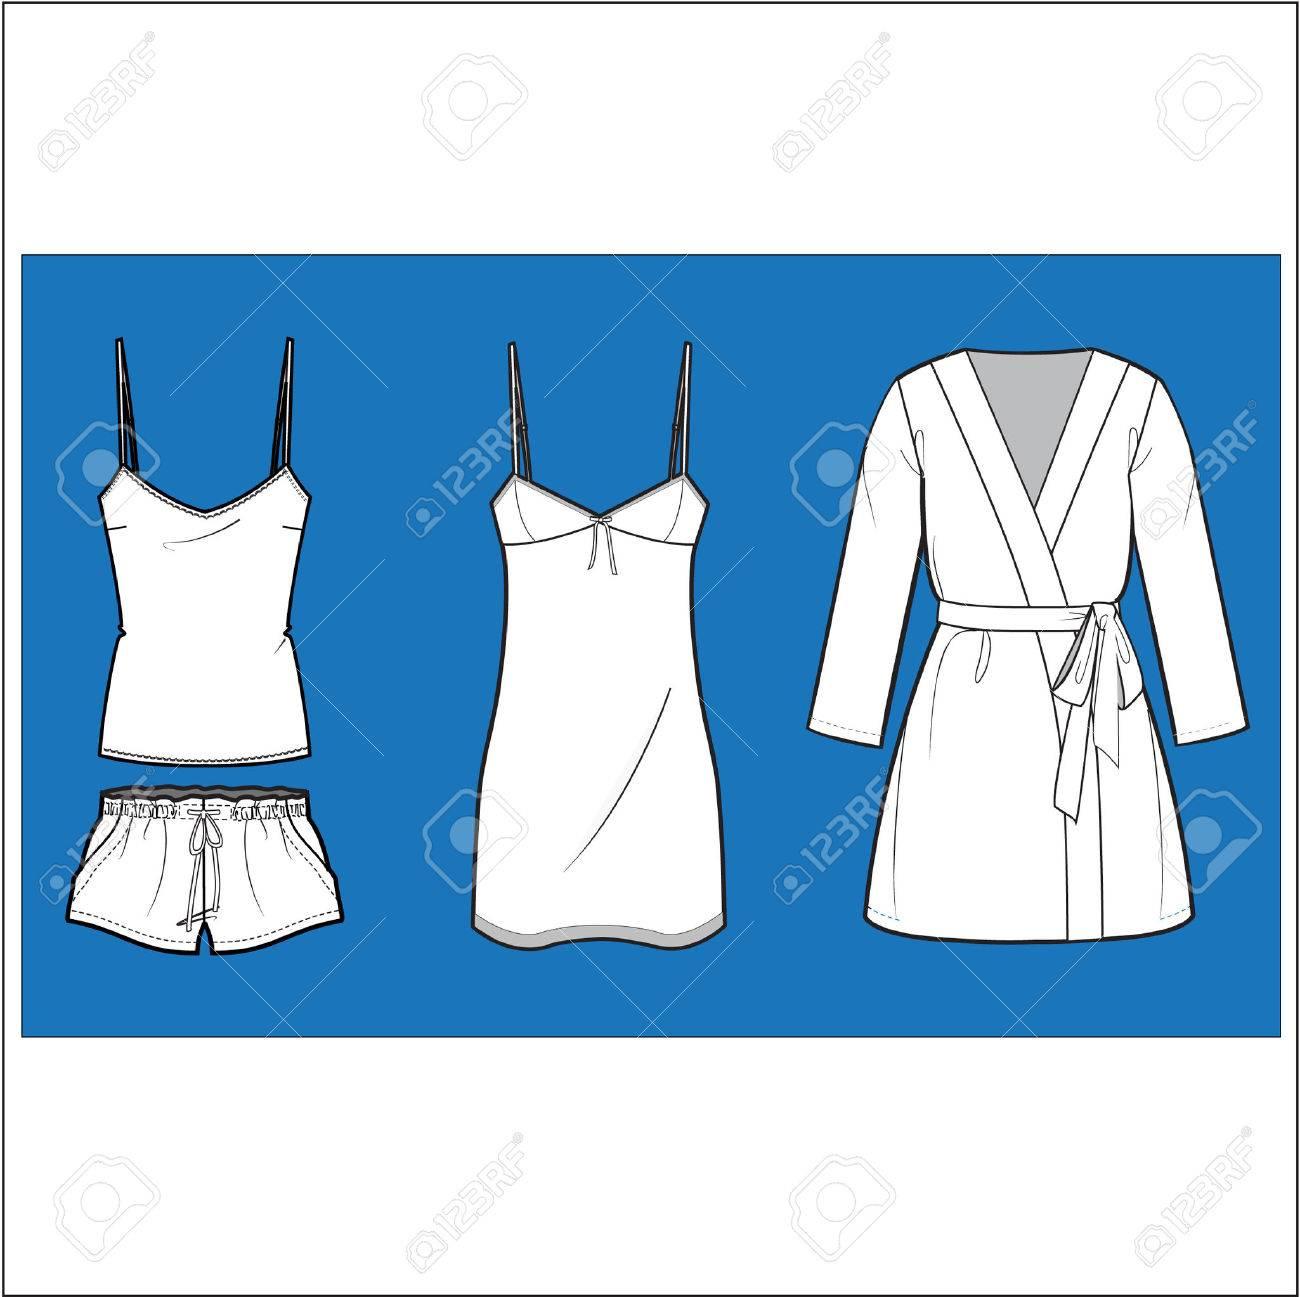 Women�s  fashion Sleepwear vector  set Stock Vector - 3728759